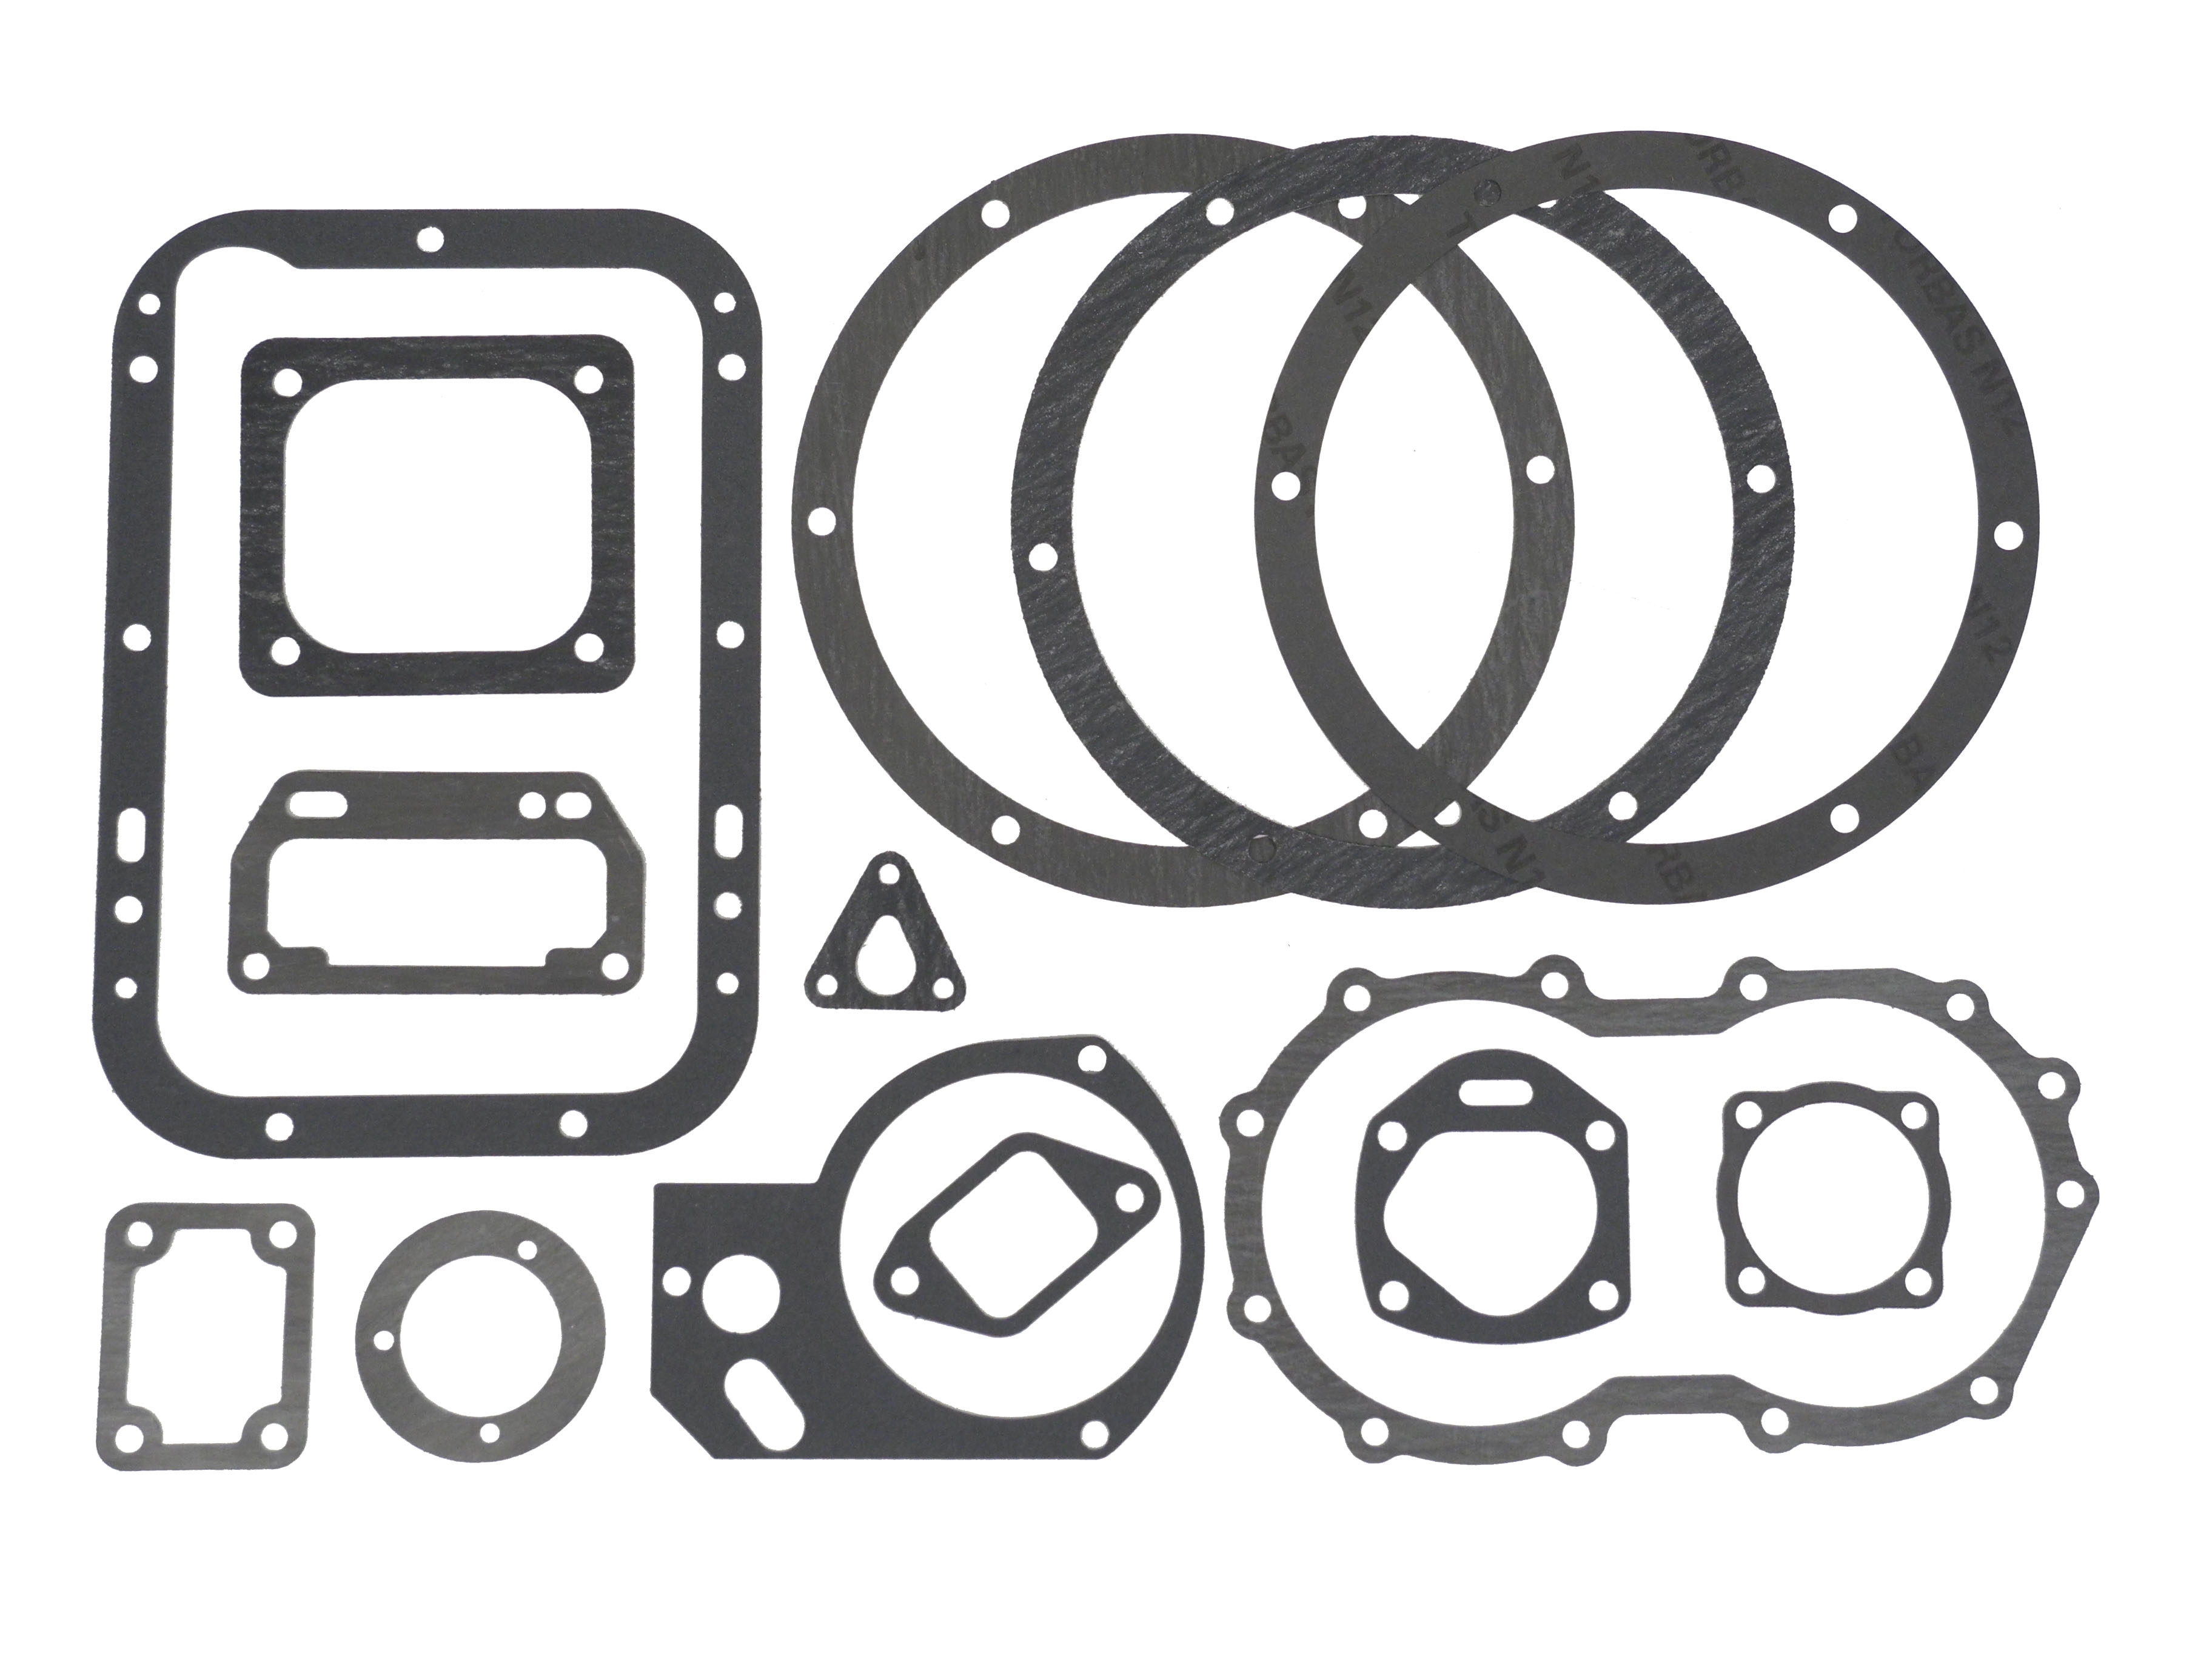 AKD 112 Öleinfülldeckel/_MWM-Motor/_AKD 12